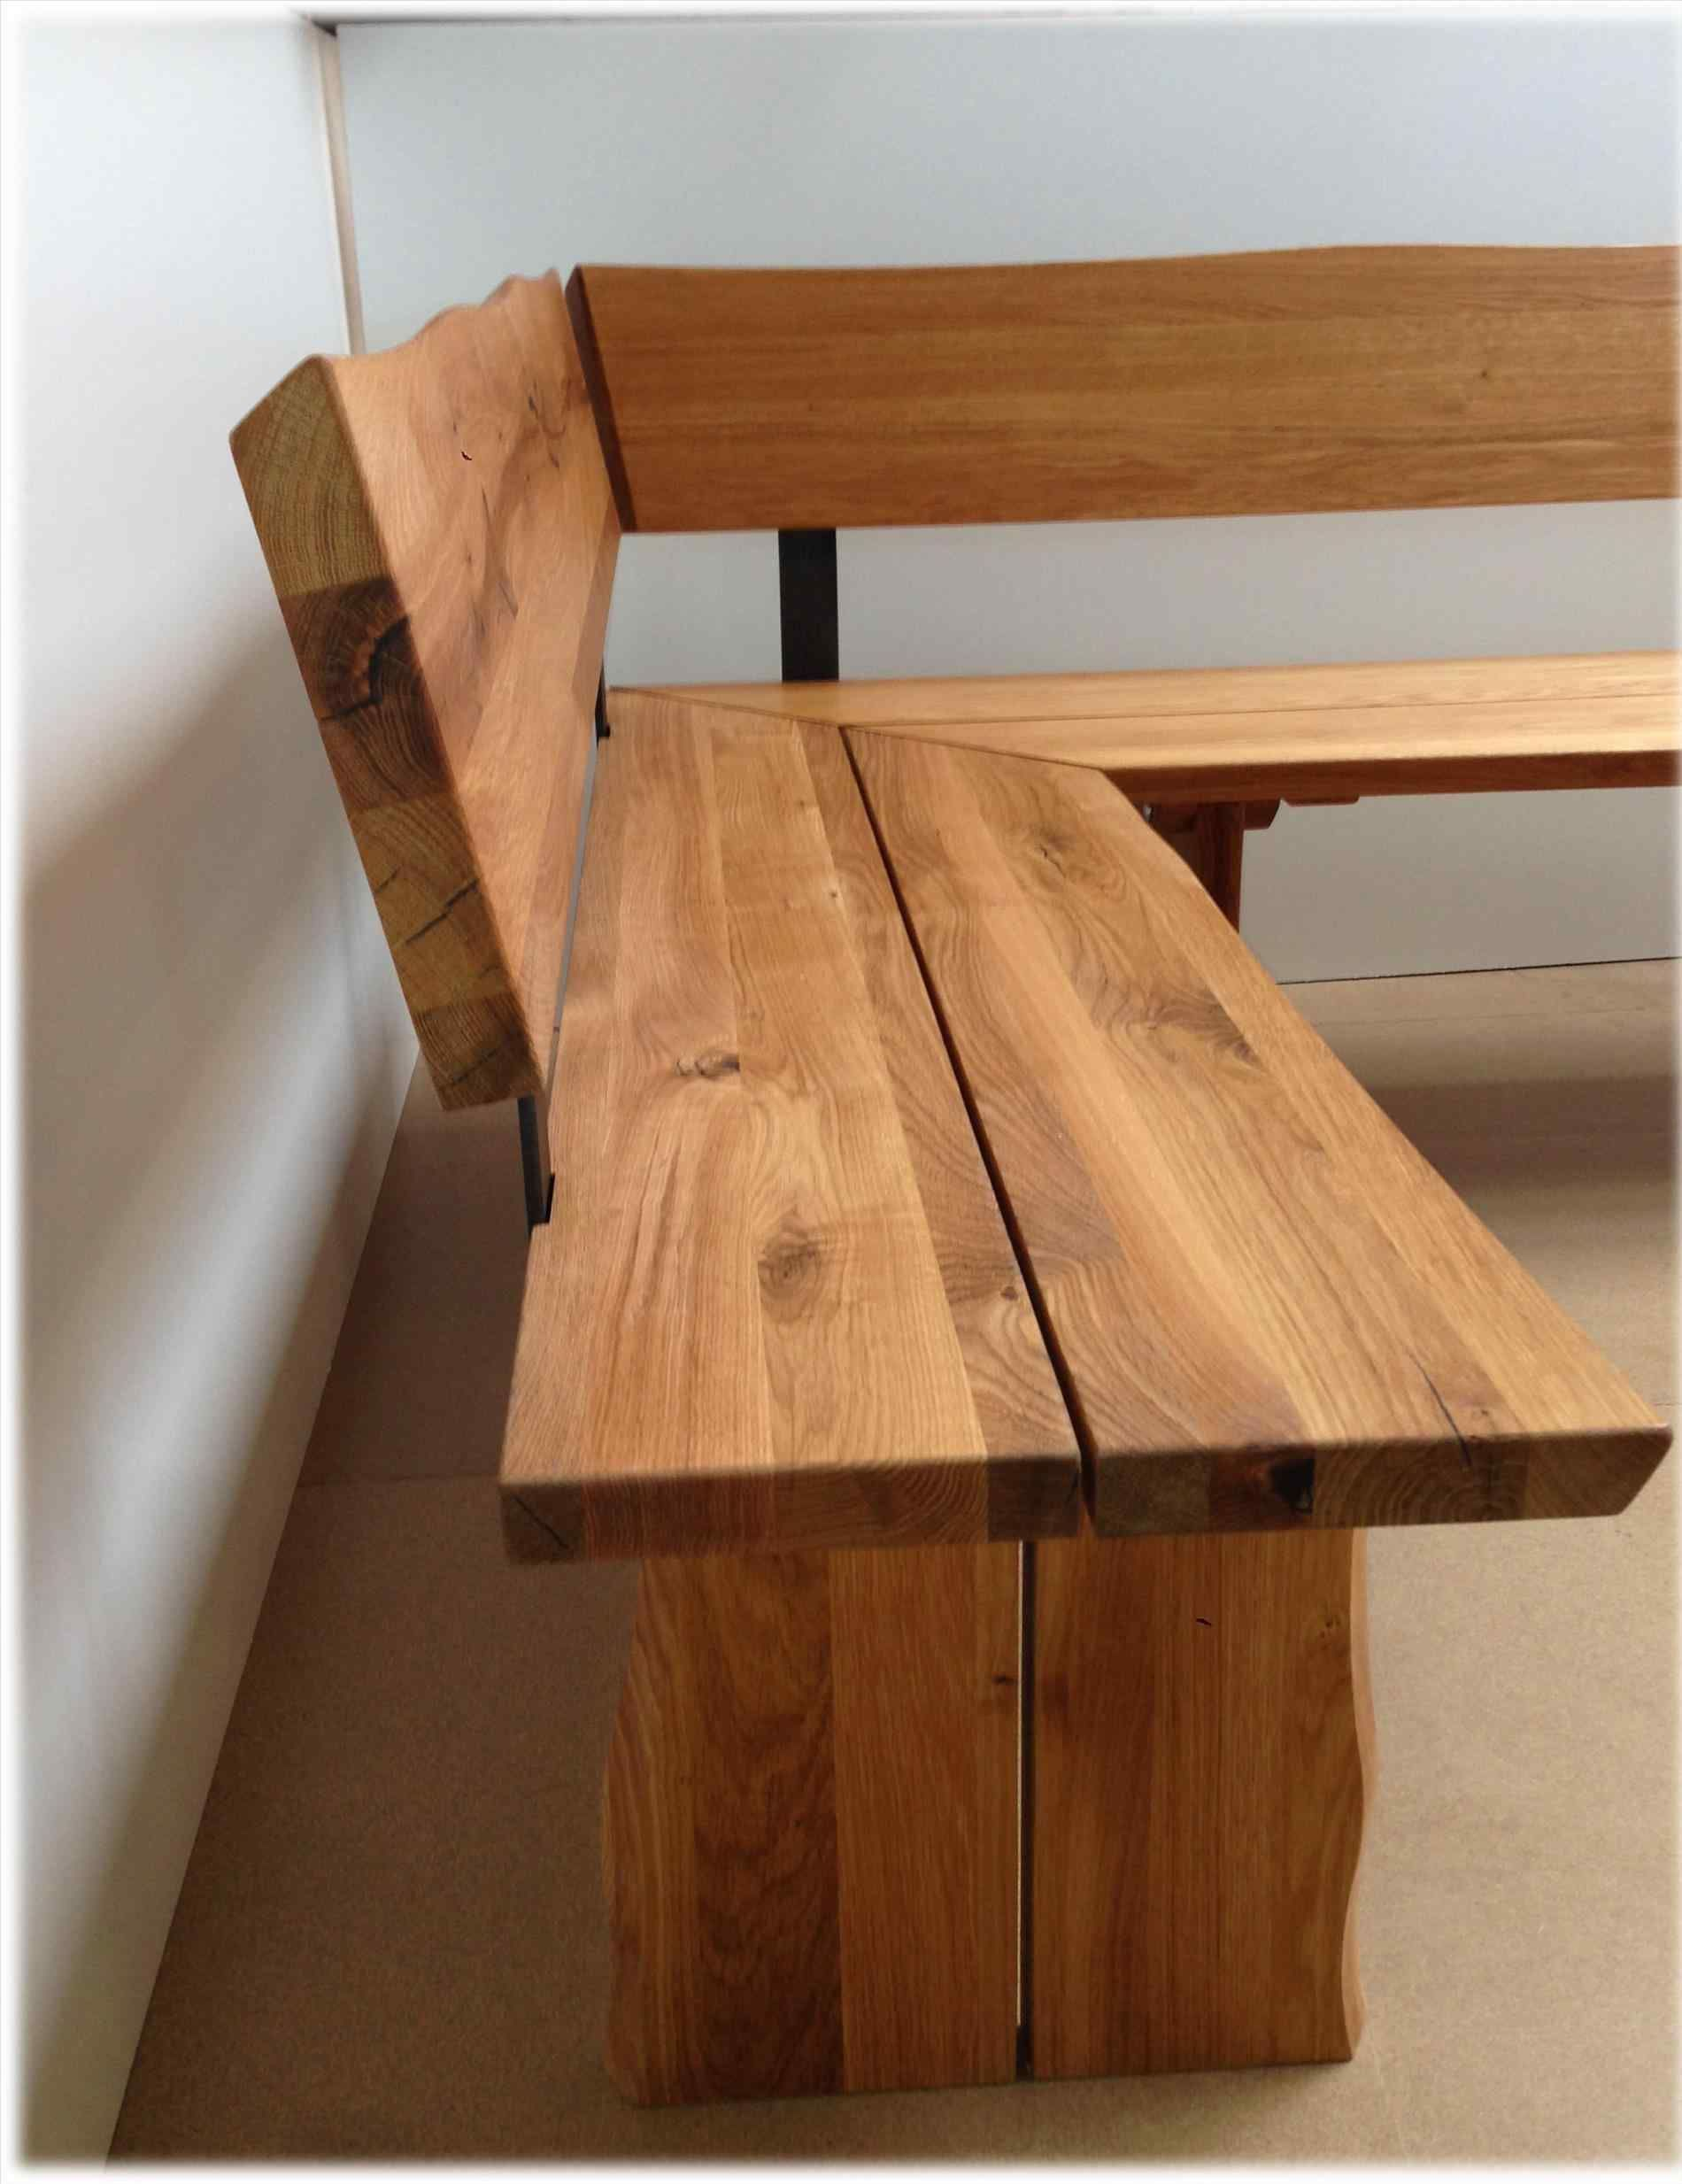 Eckbank Eiche In 2020 Corner Bench Furniture Country Furniture